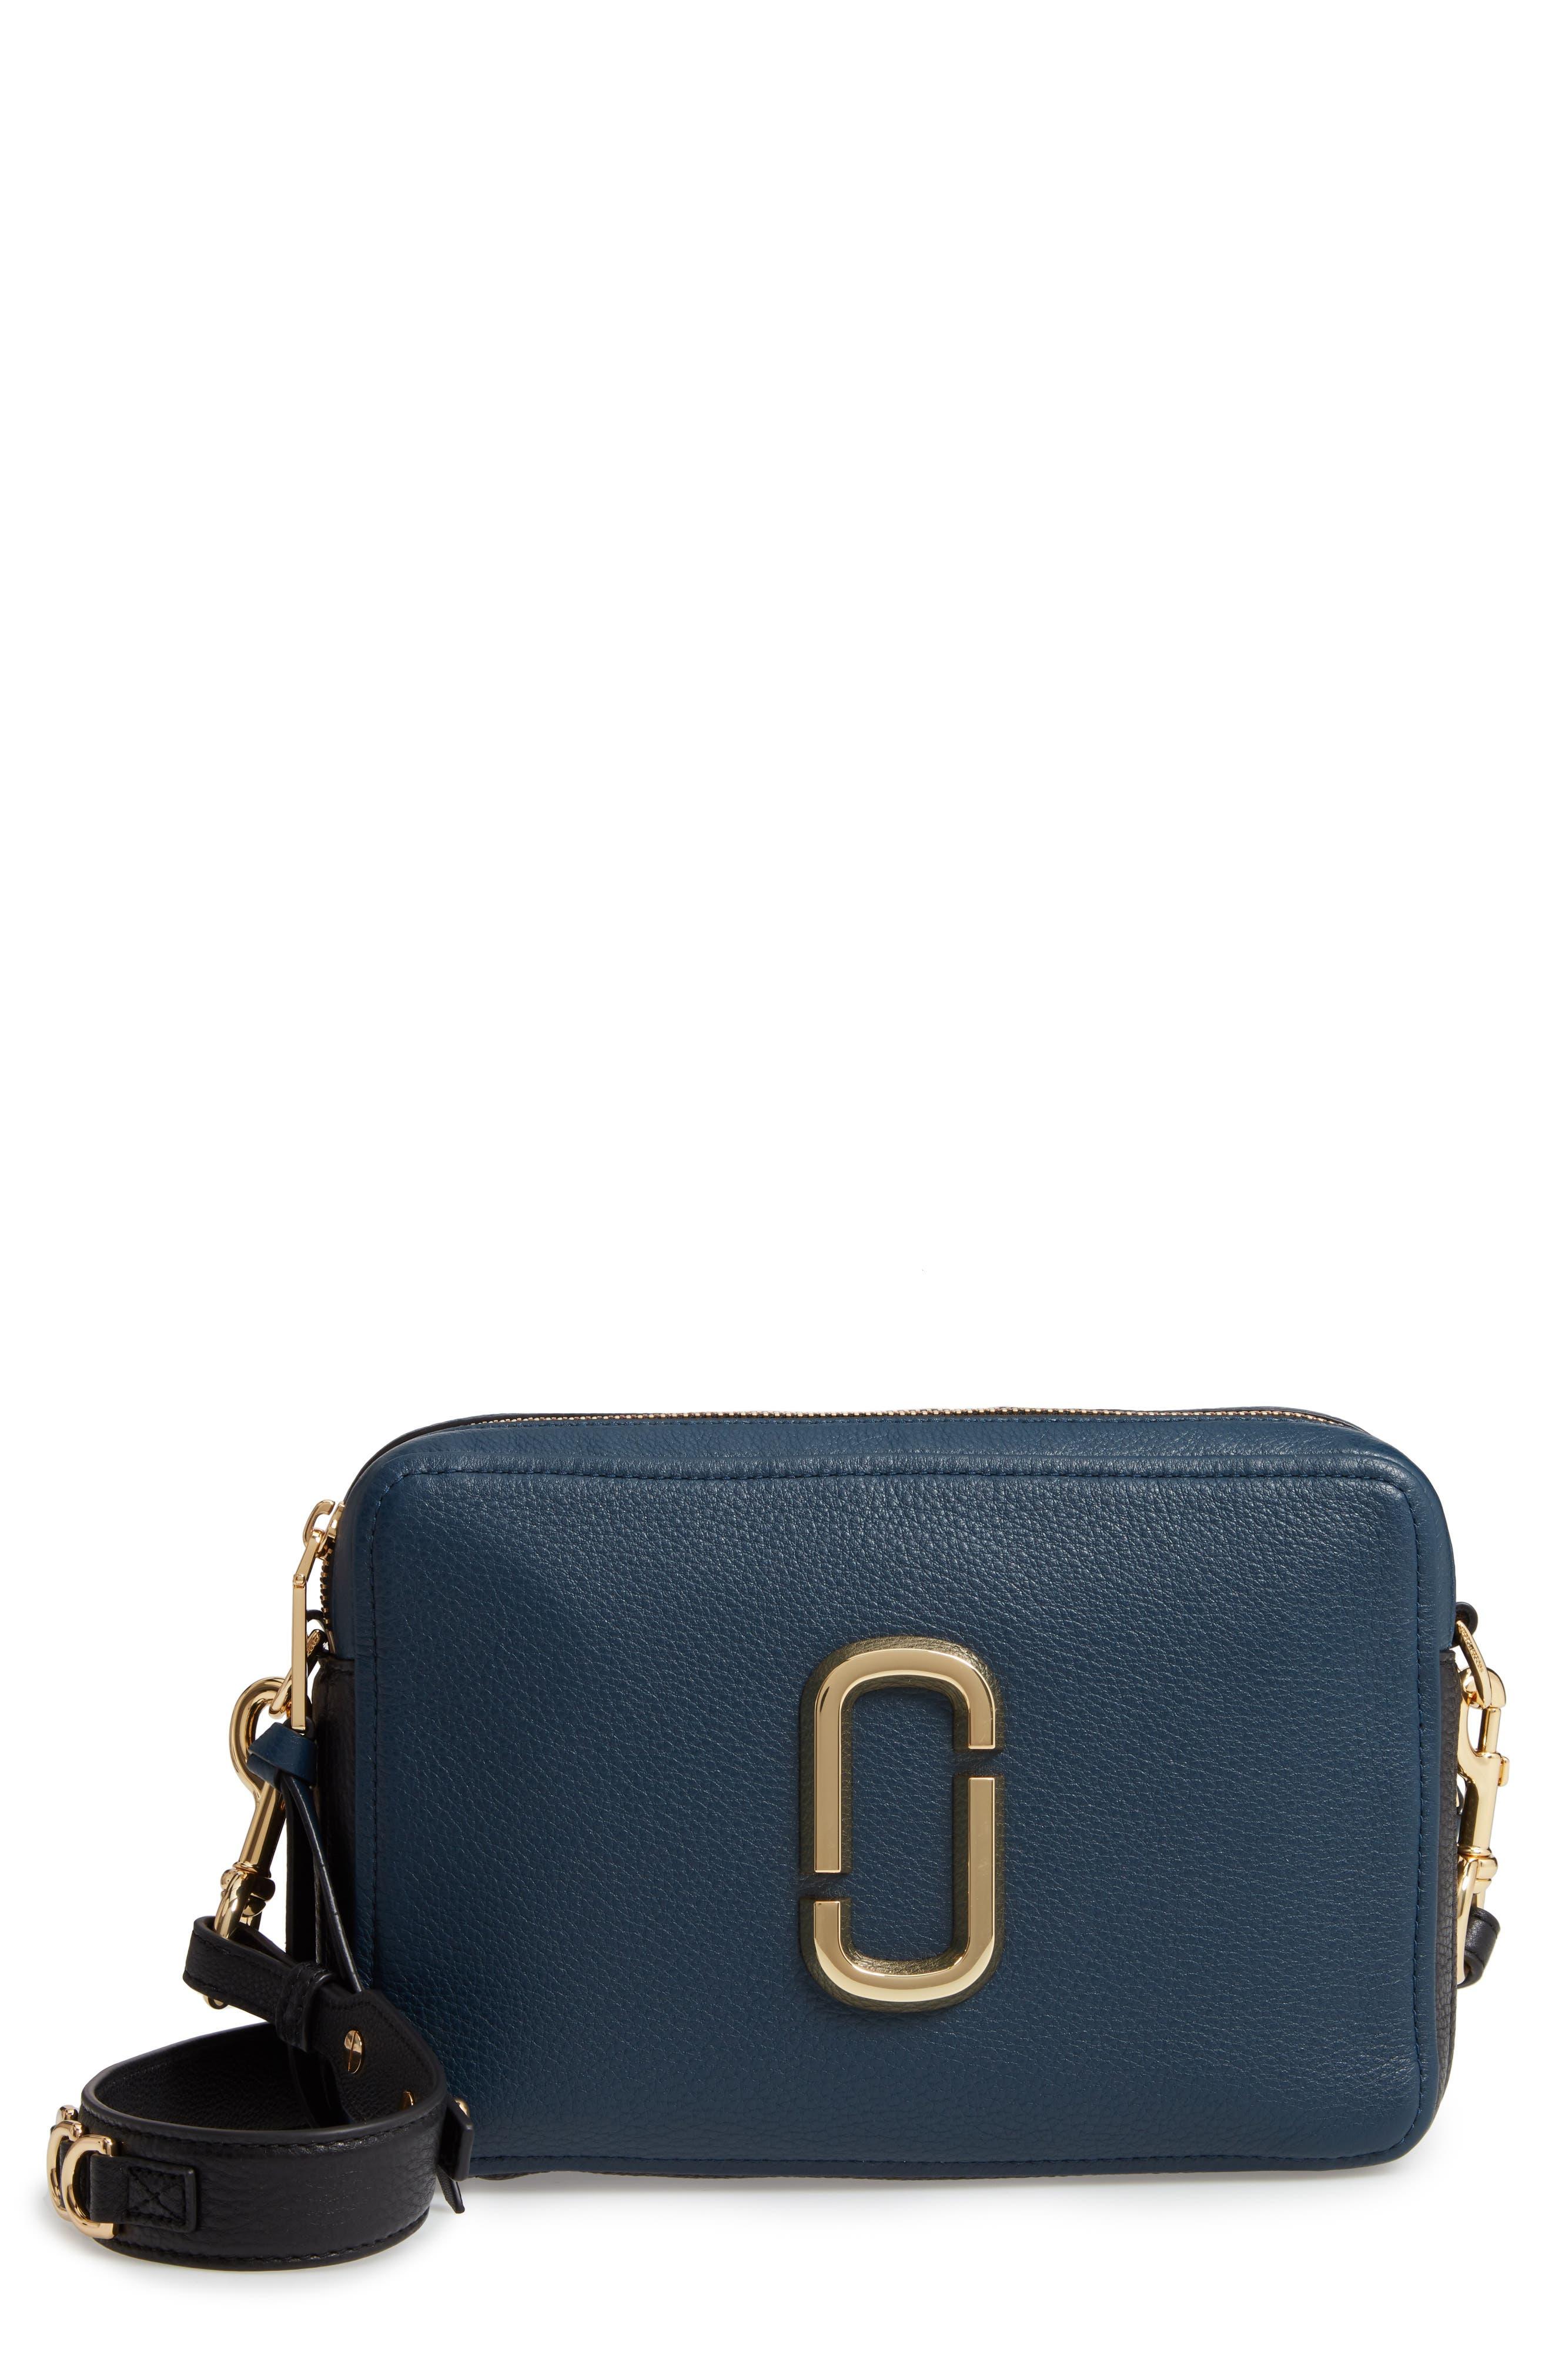 The Softshot 21 Leather Crossbody Bag in Blue Sea Multi